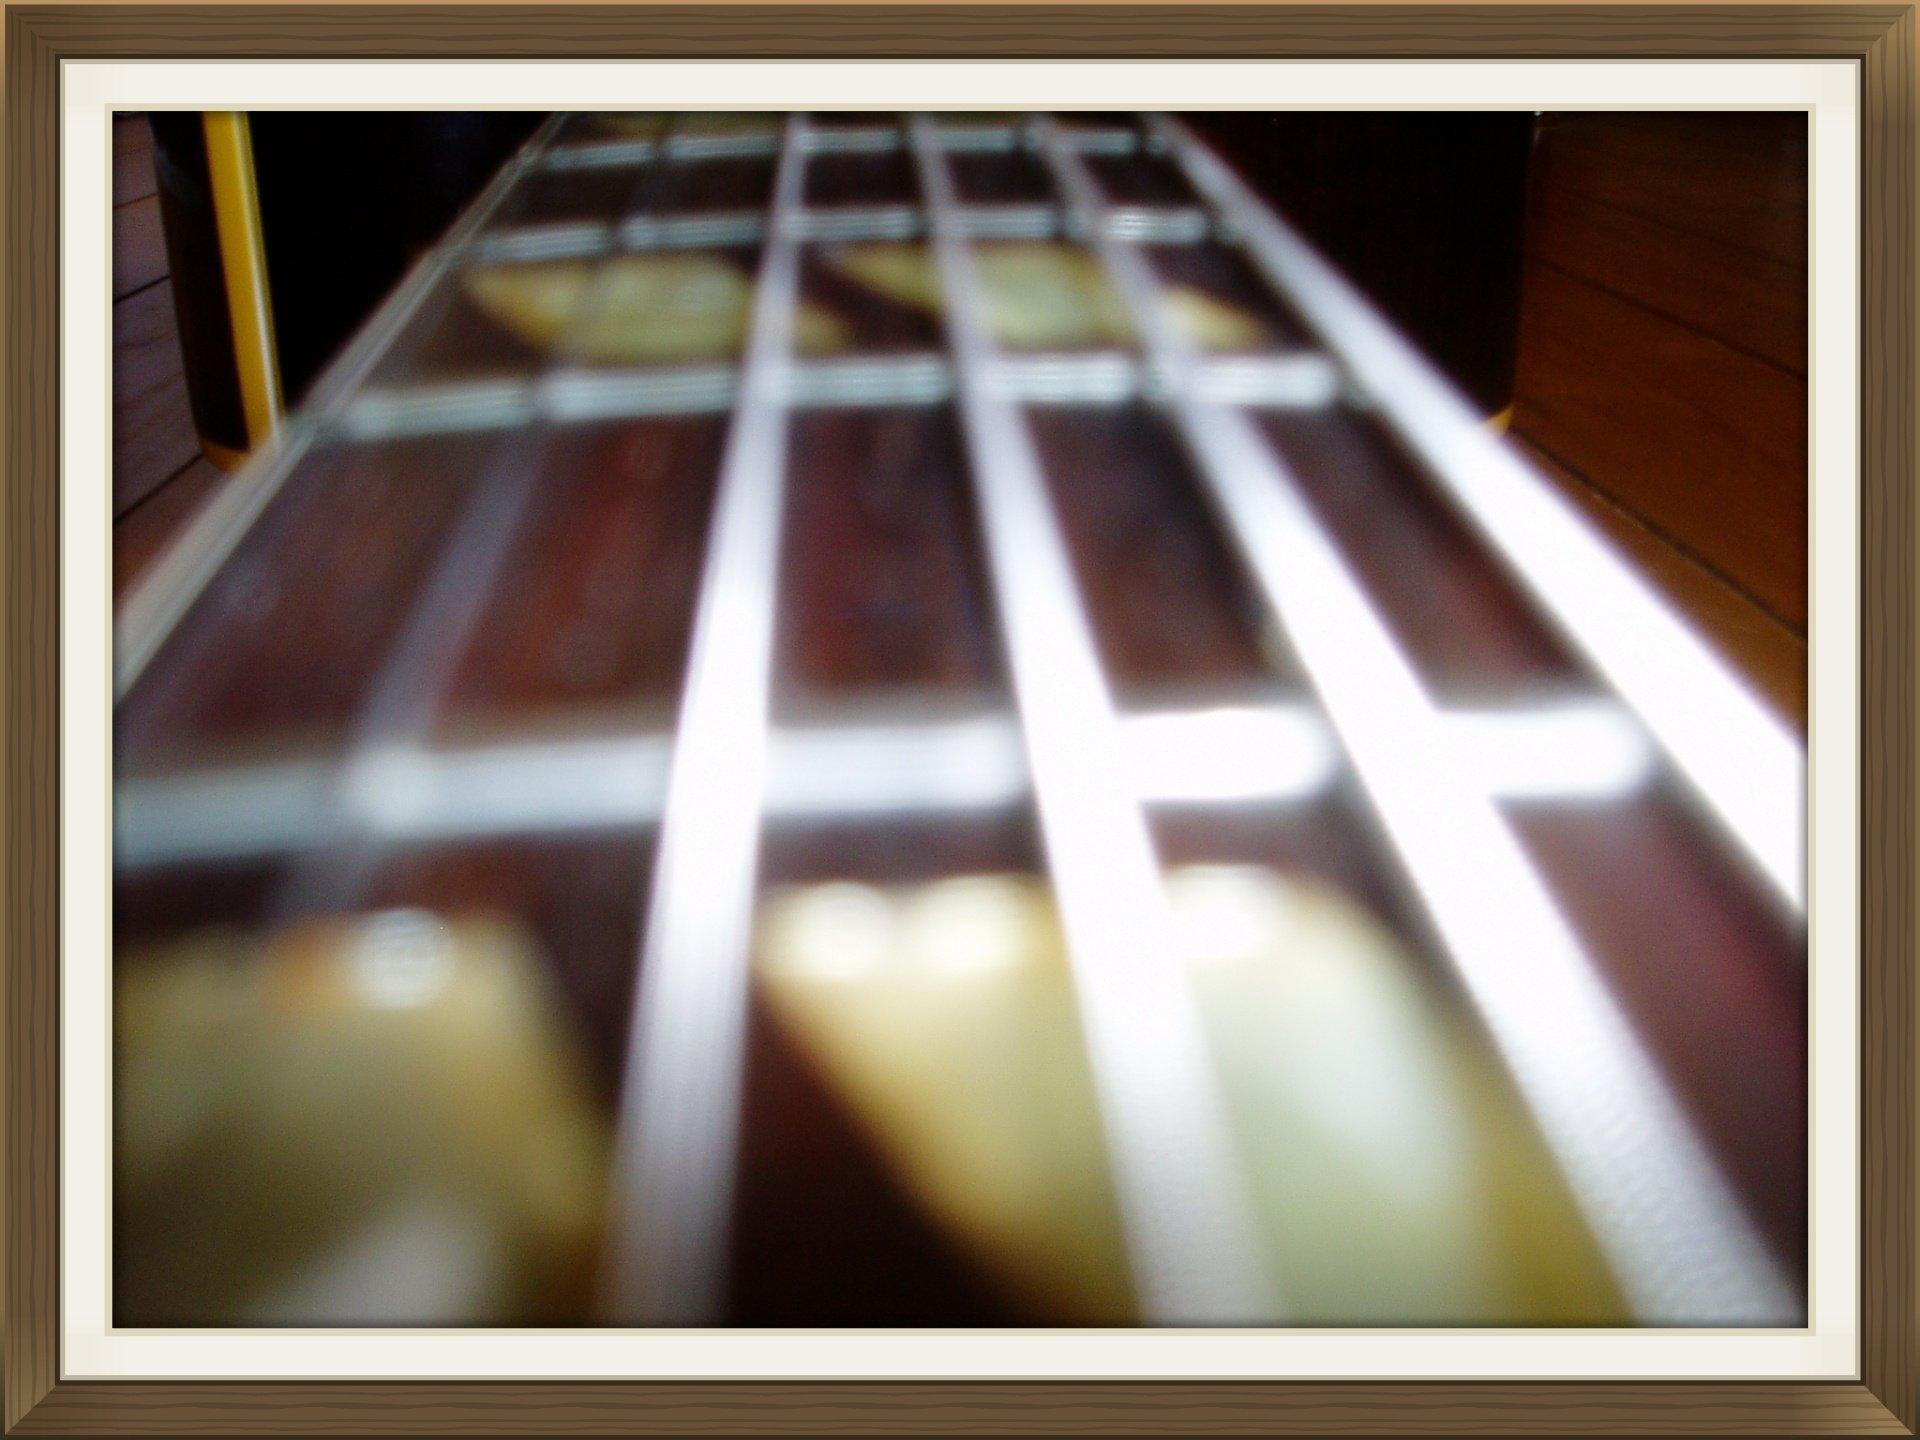 MannofieldMusic Guitar Lessons West Bridgford Nottingham